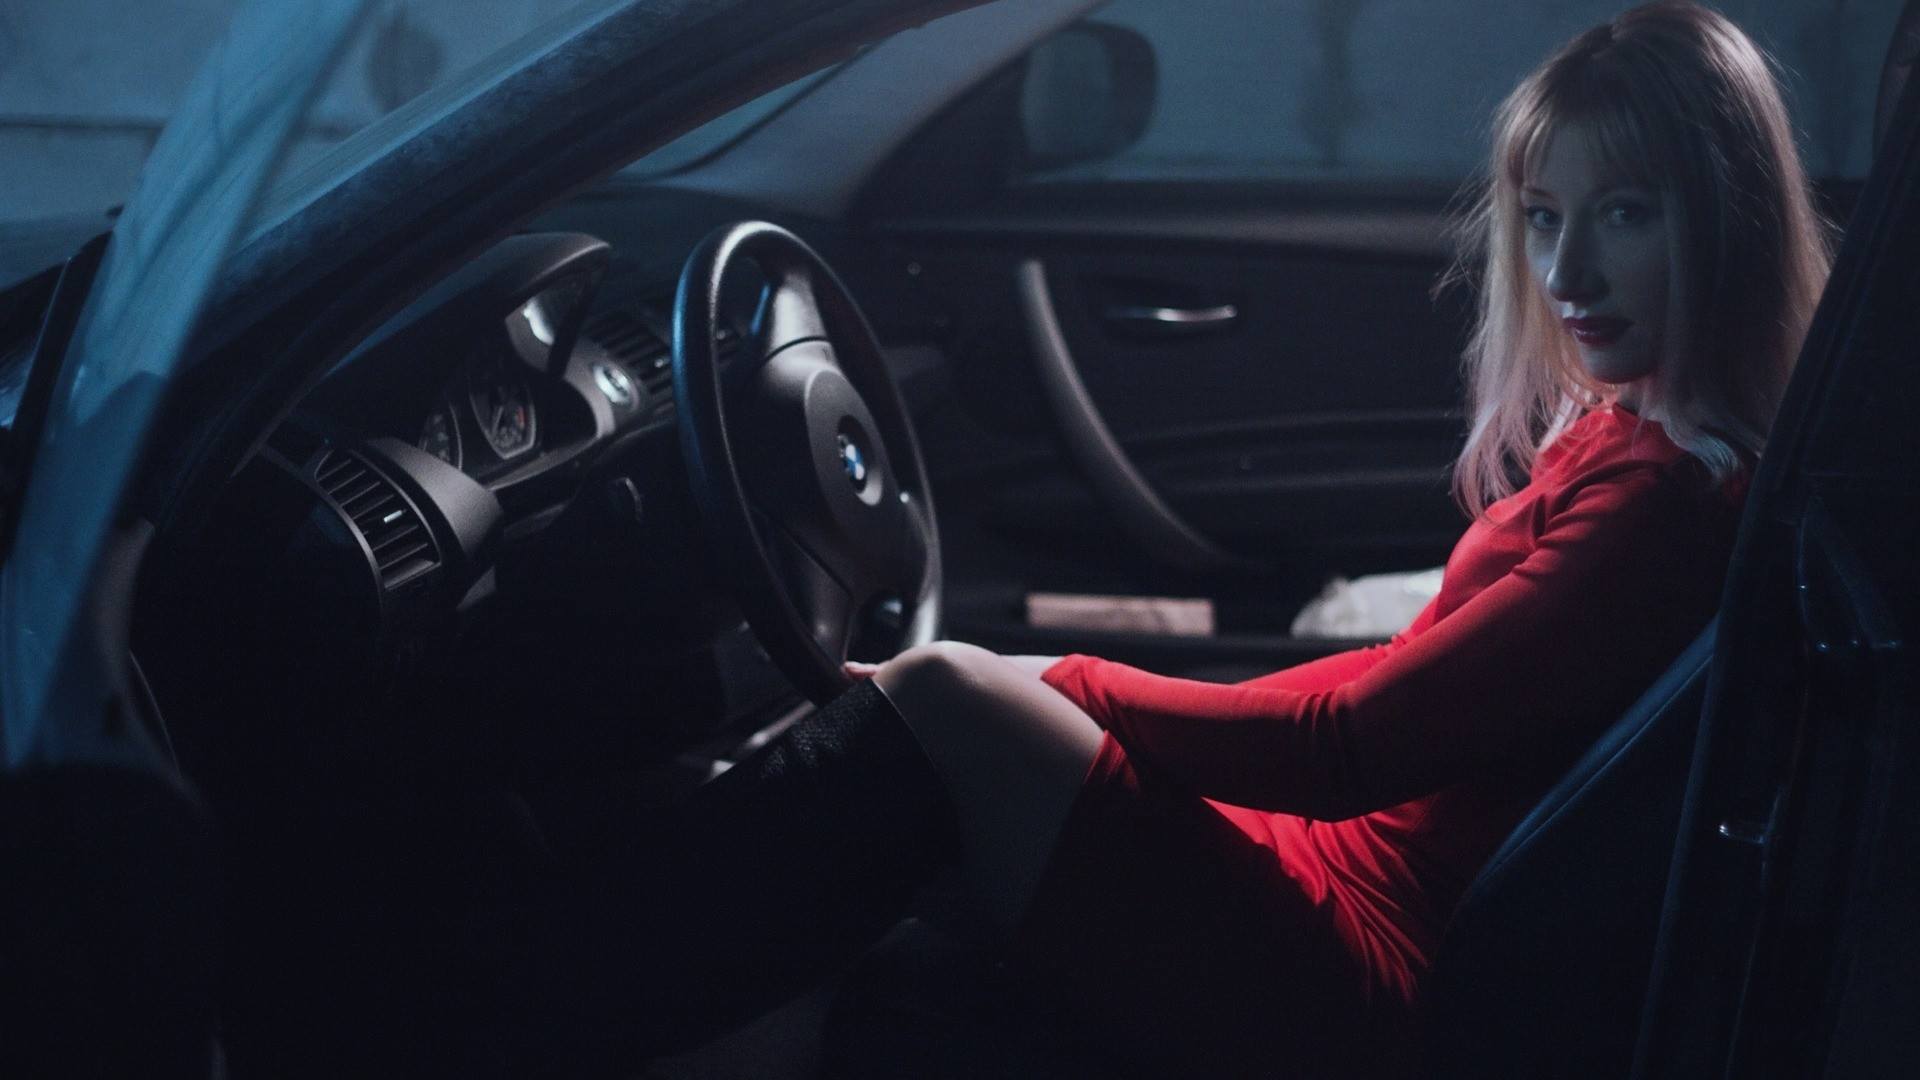 jolie blondinette voiture